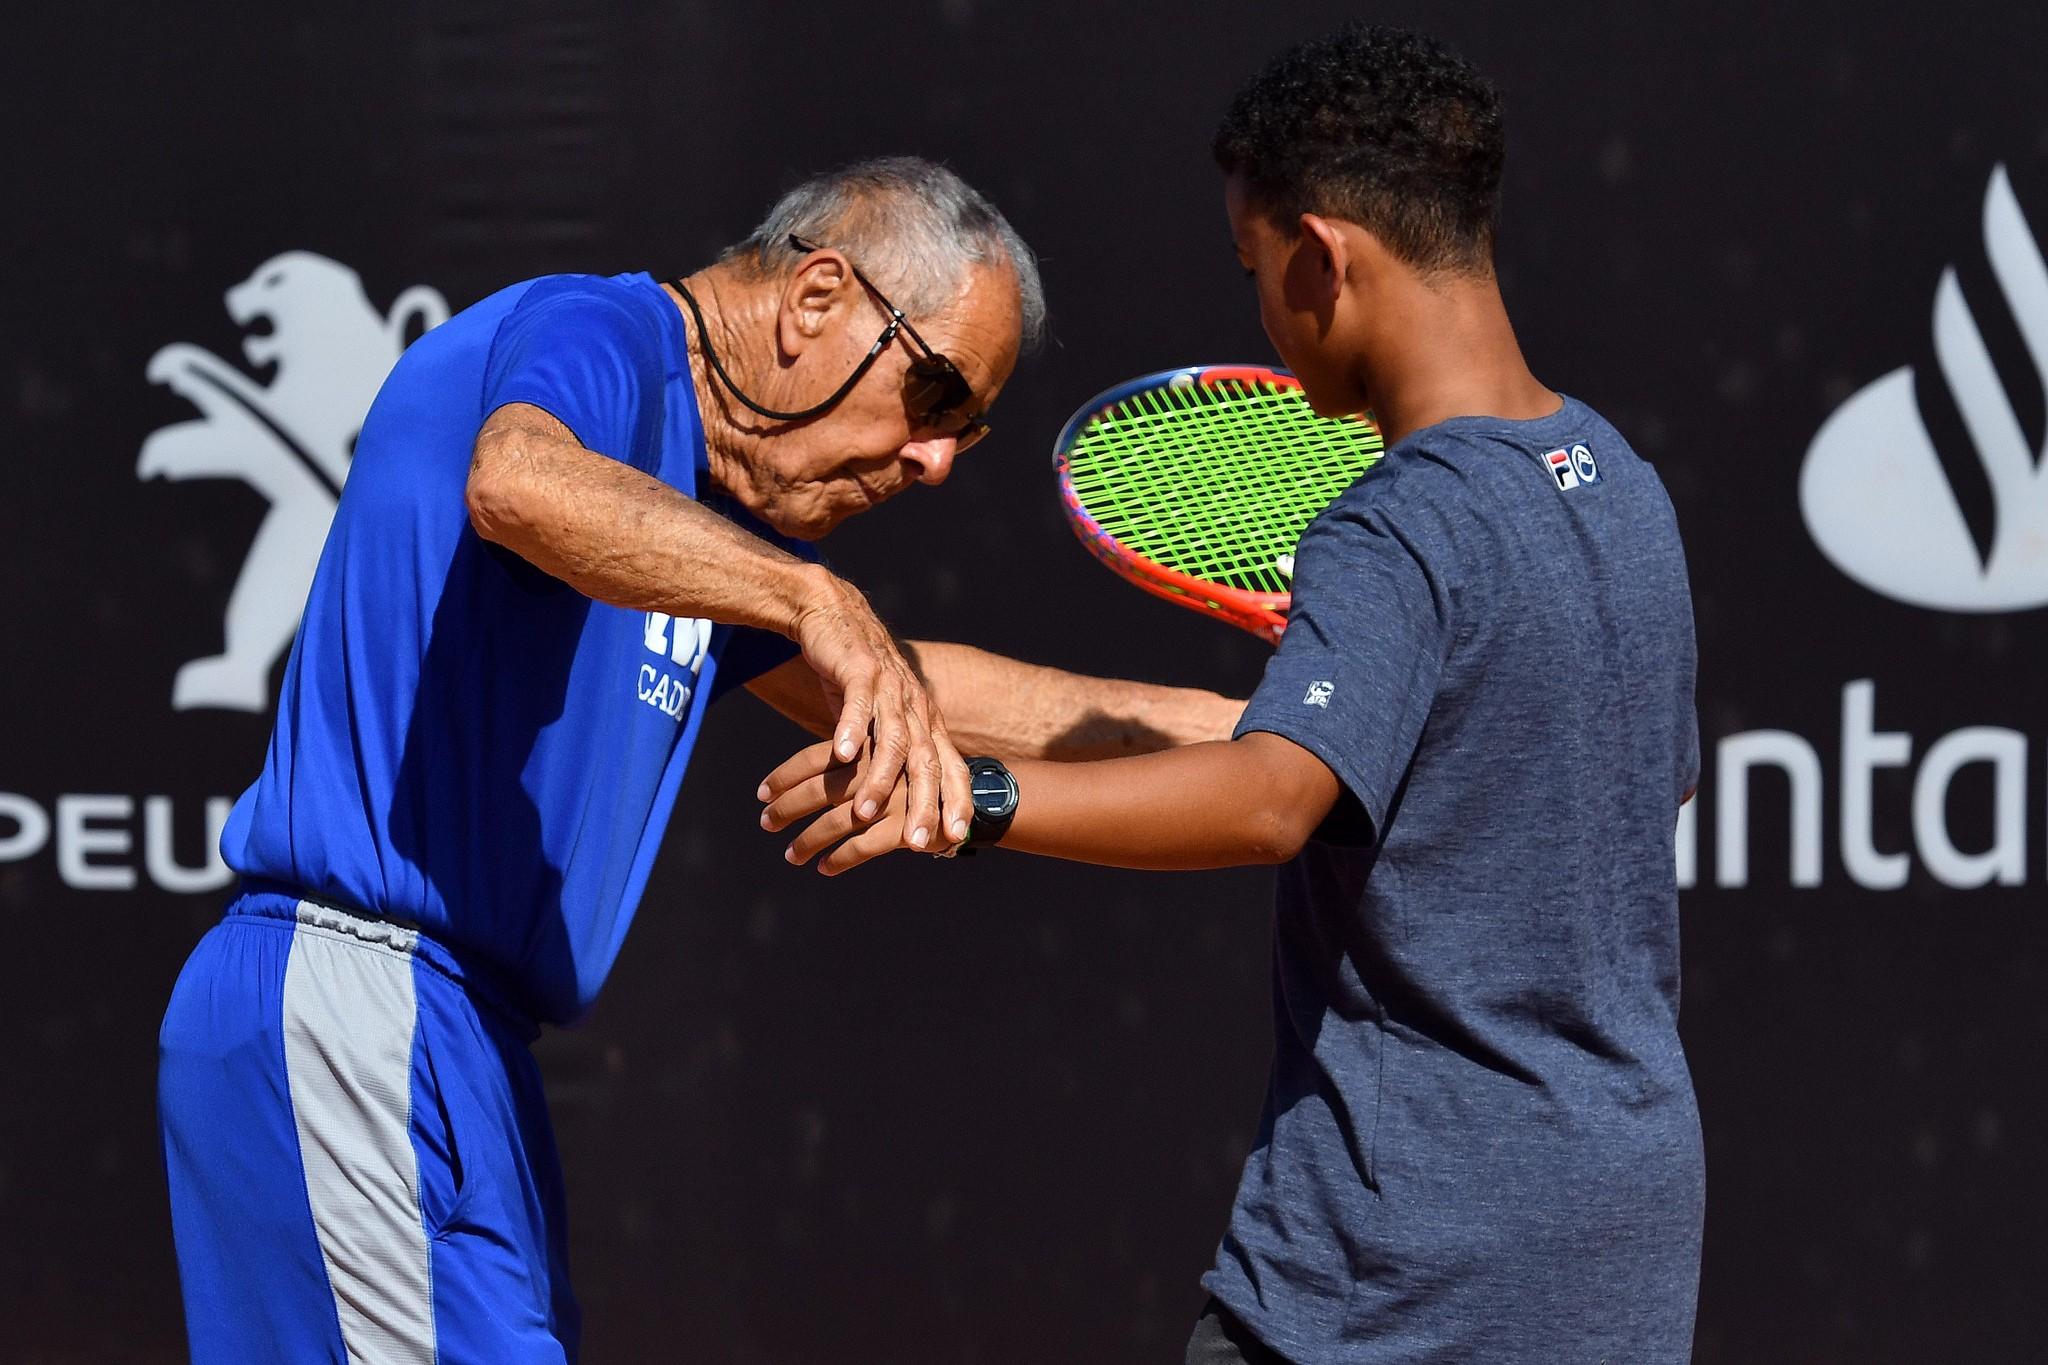 Bollettieri ensina aluno durante clínica no Rio Open